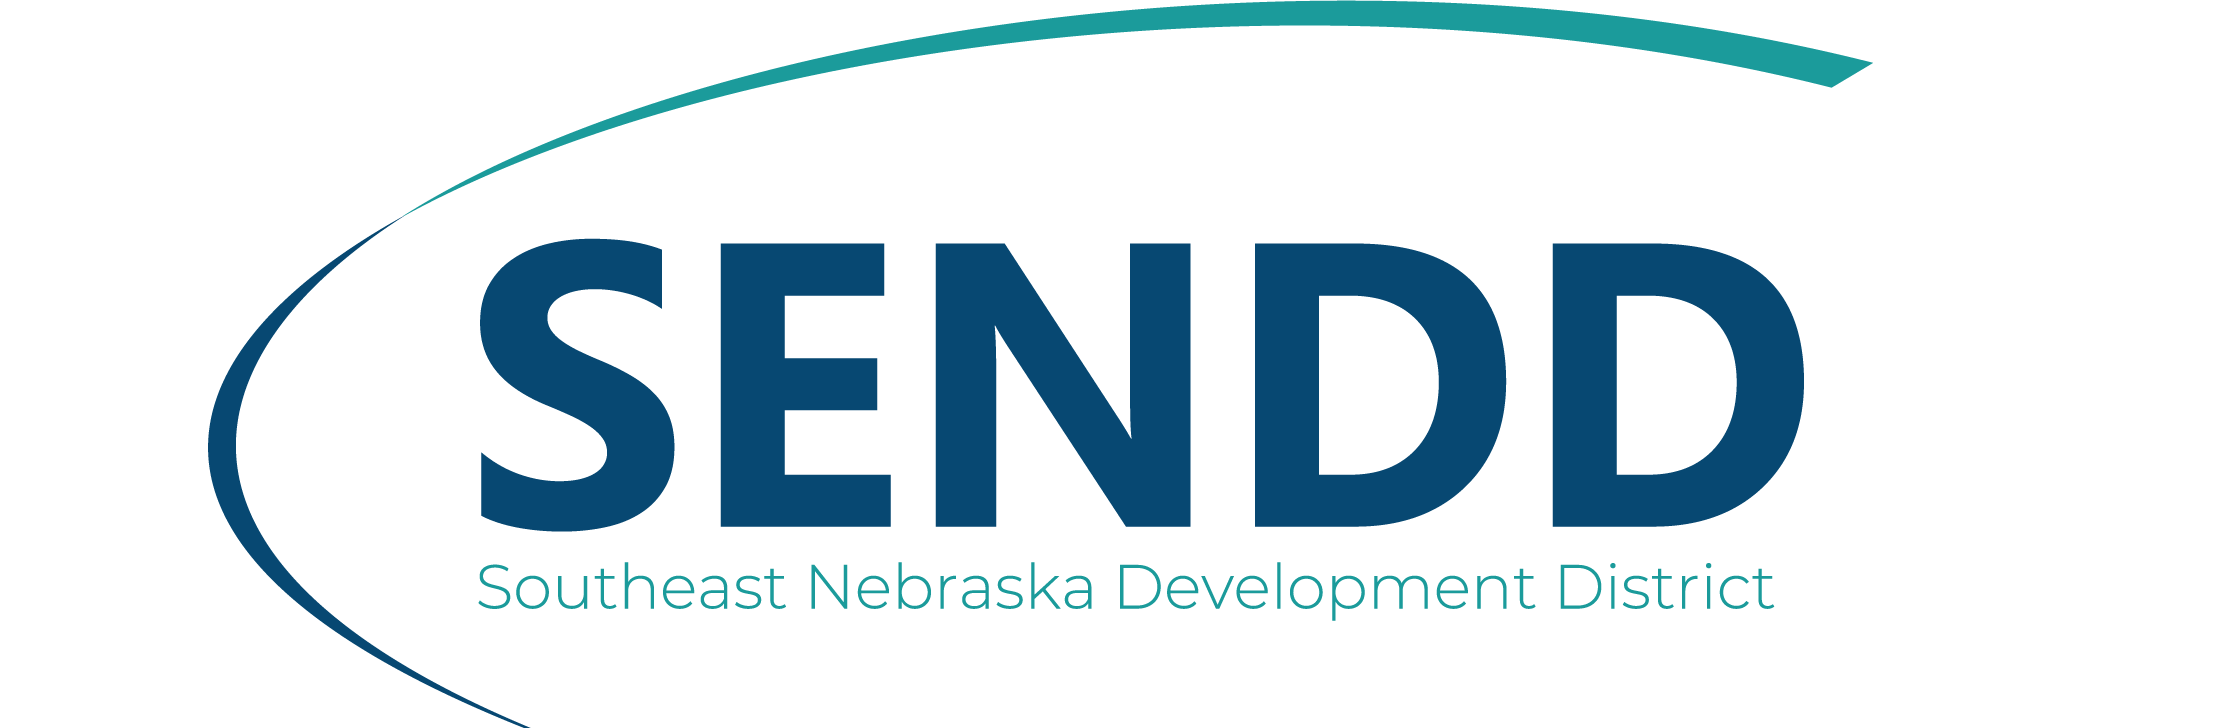 SENDD Logo